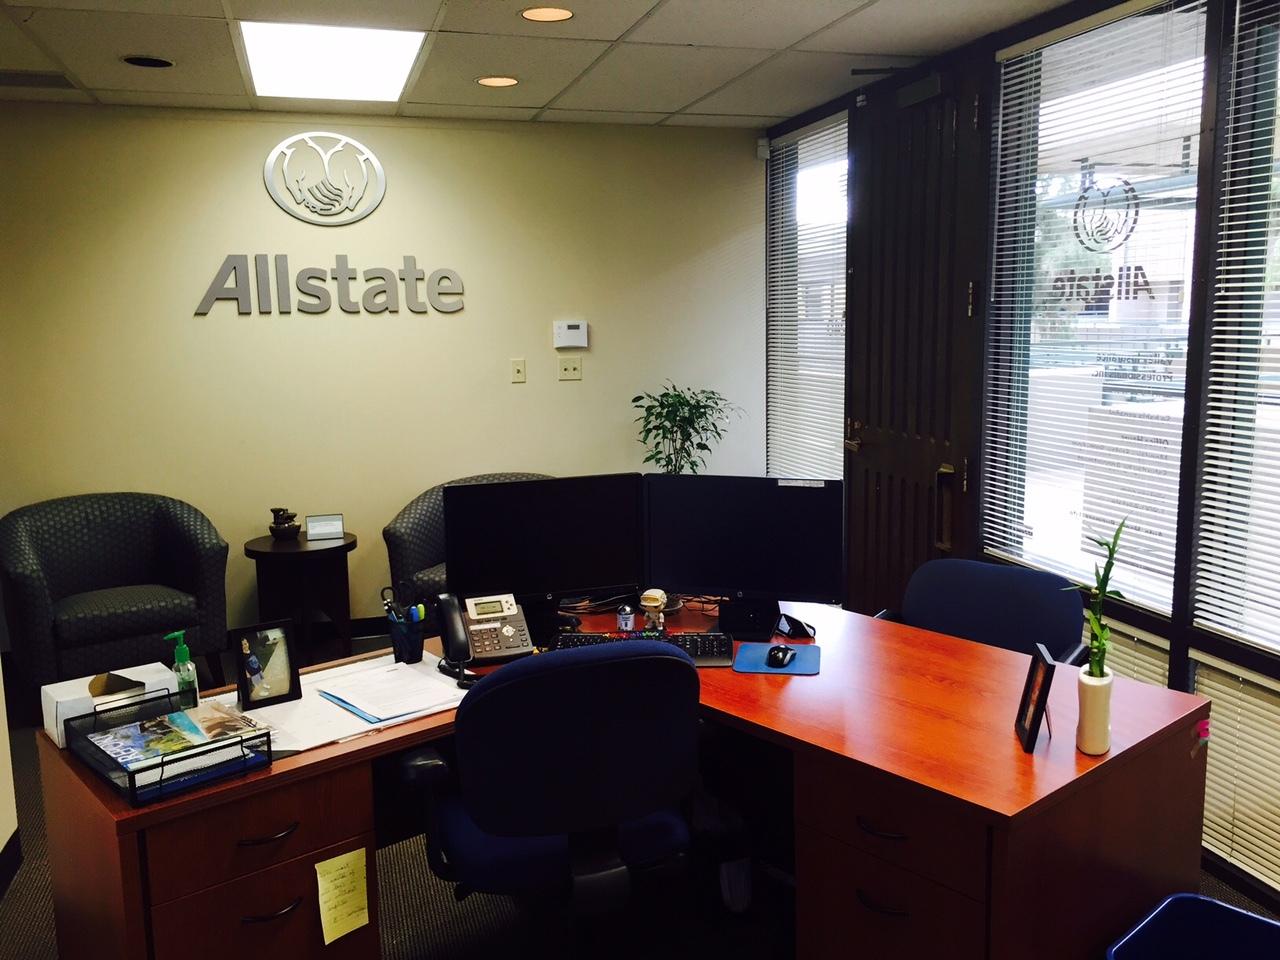 Allstate Insurance Agent: Sonia Bhushan image 2